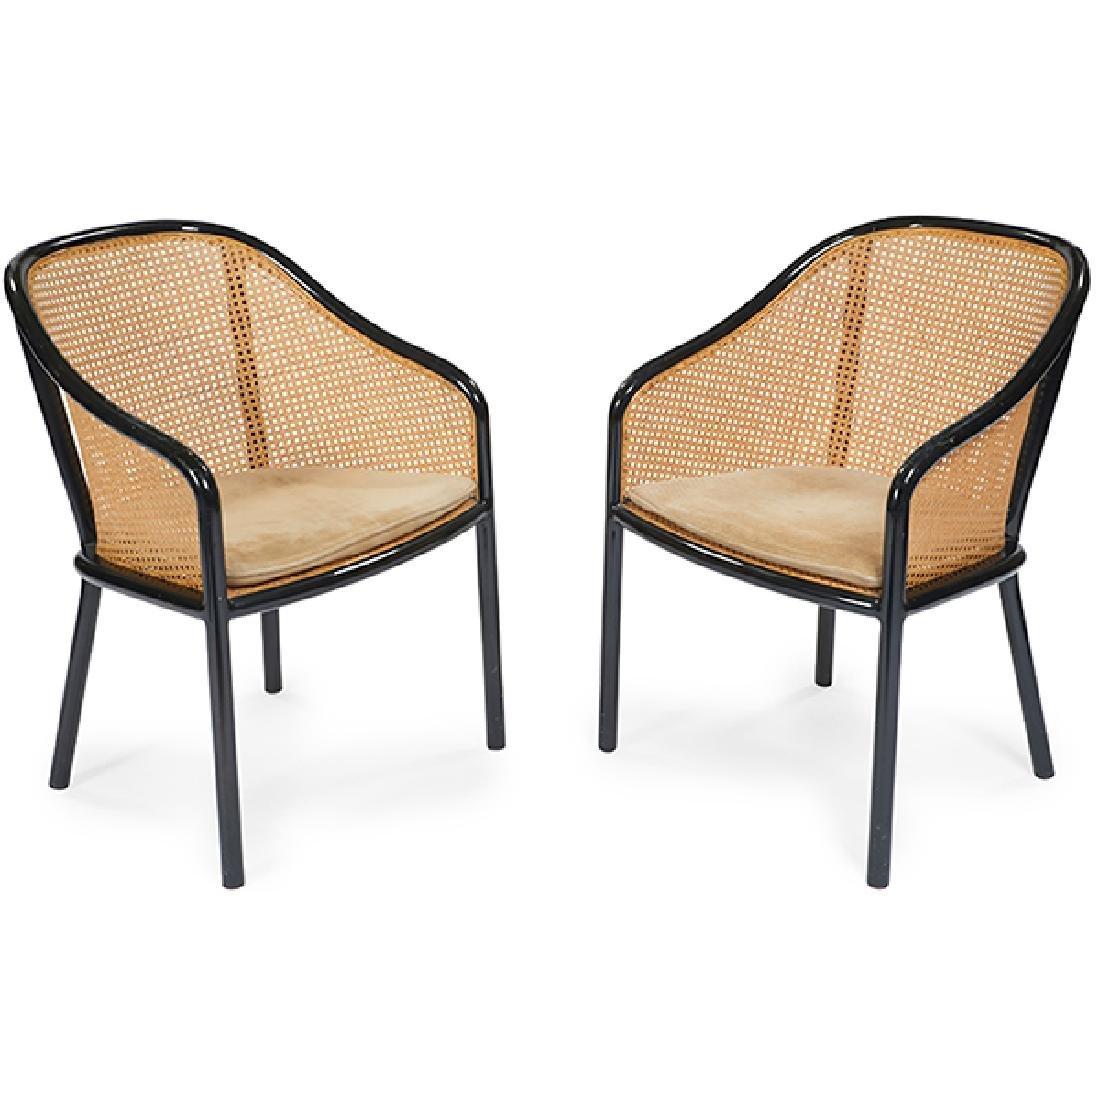 Ward Bennett for Brickel Associates armchairs, pair